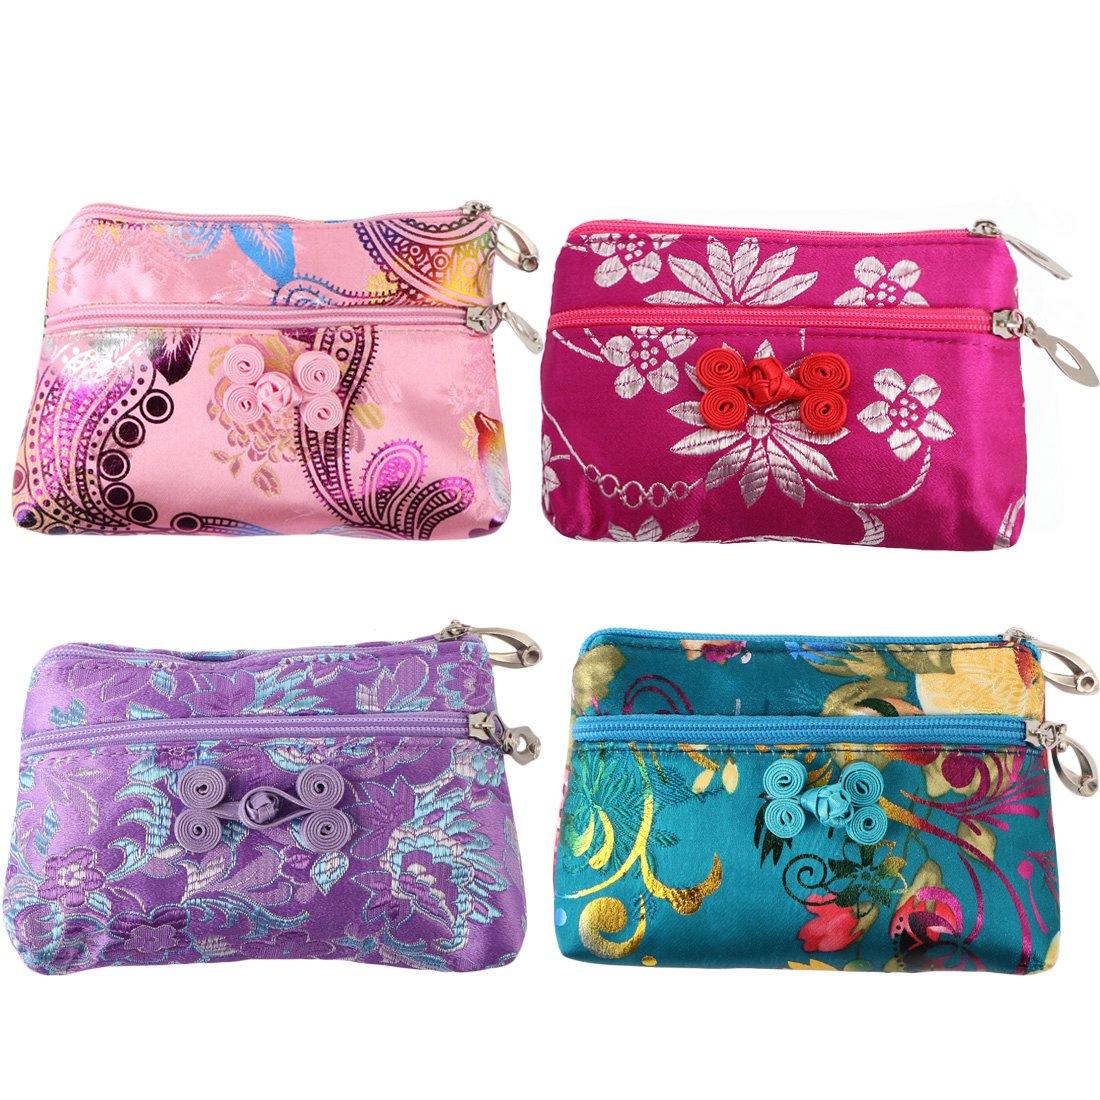 kilofly 4pc Chinese Silk Brocade 2 Zipper Purse Jewelry Pouch Bag Value Set TBA408set4